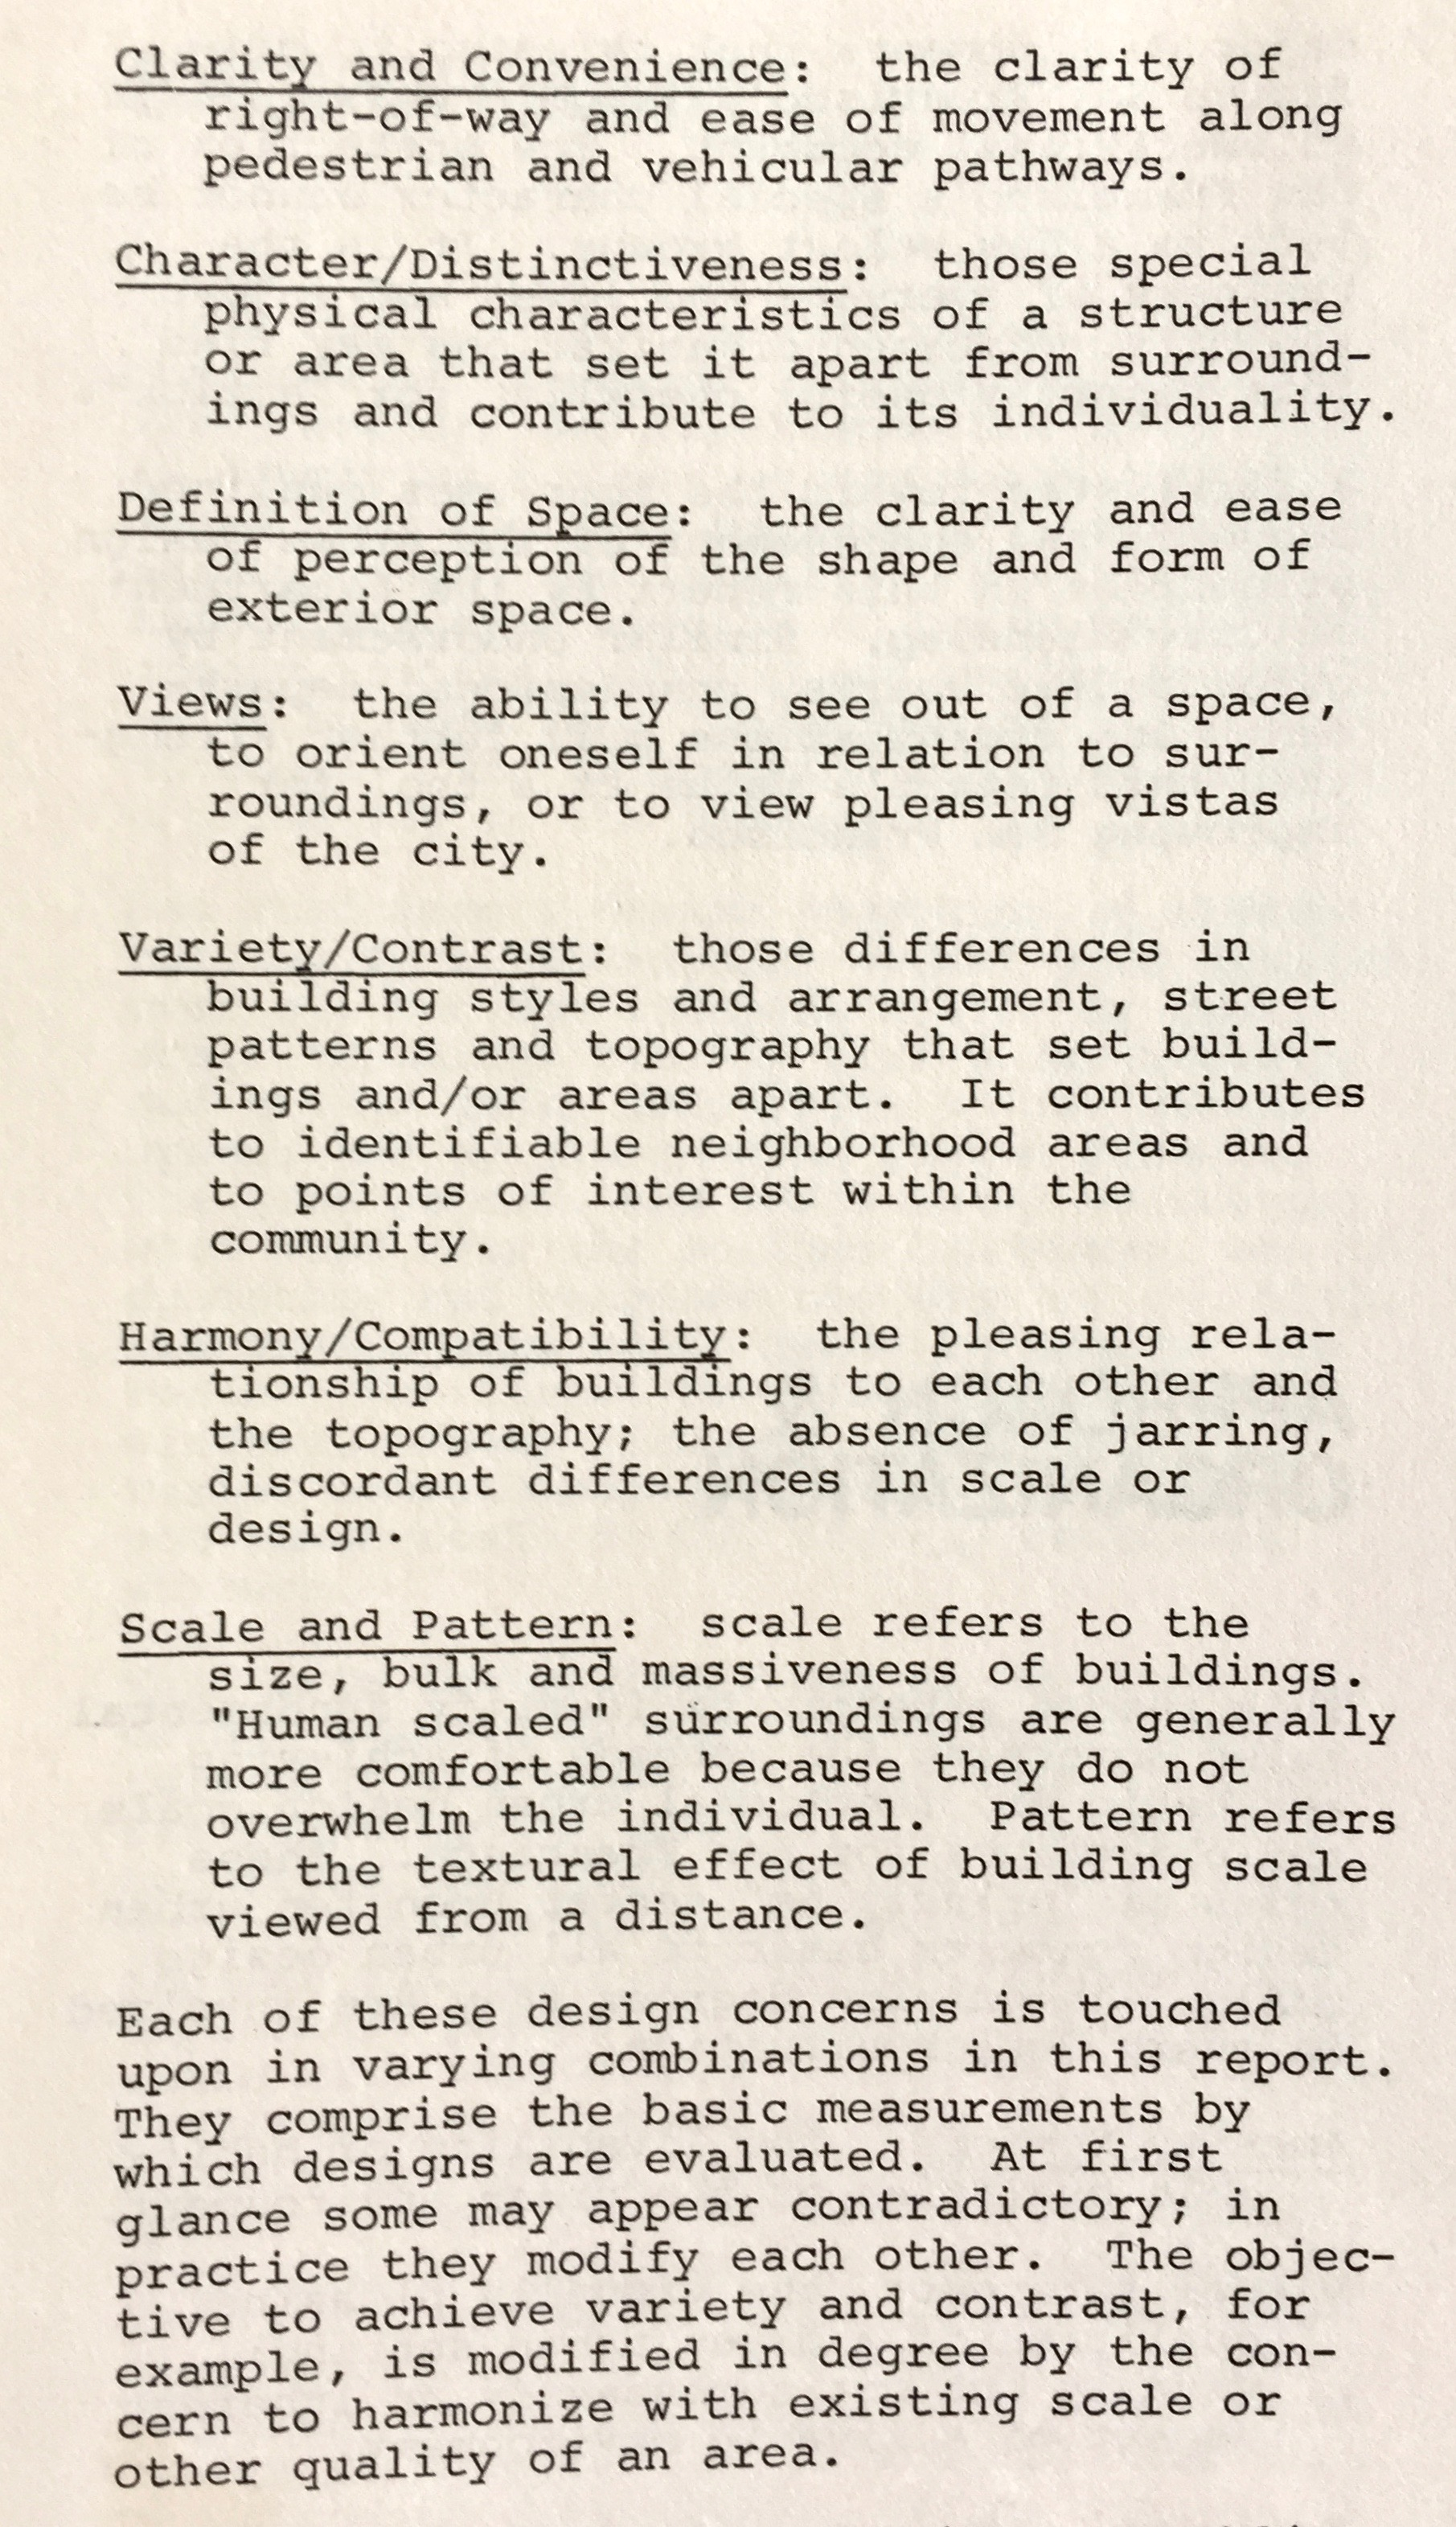 Design principle 4-10